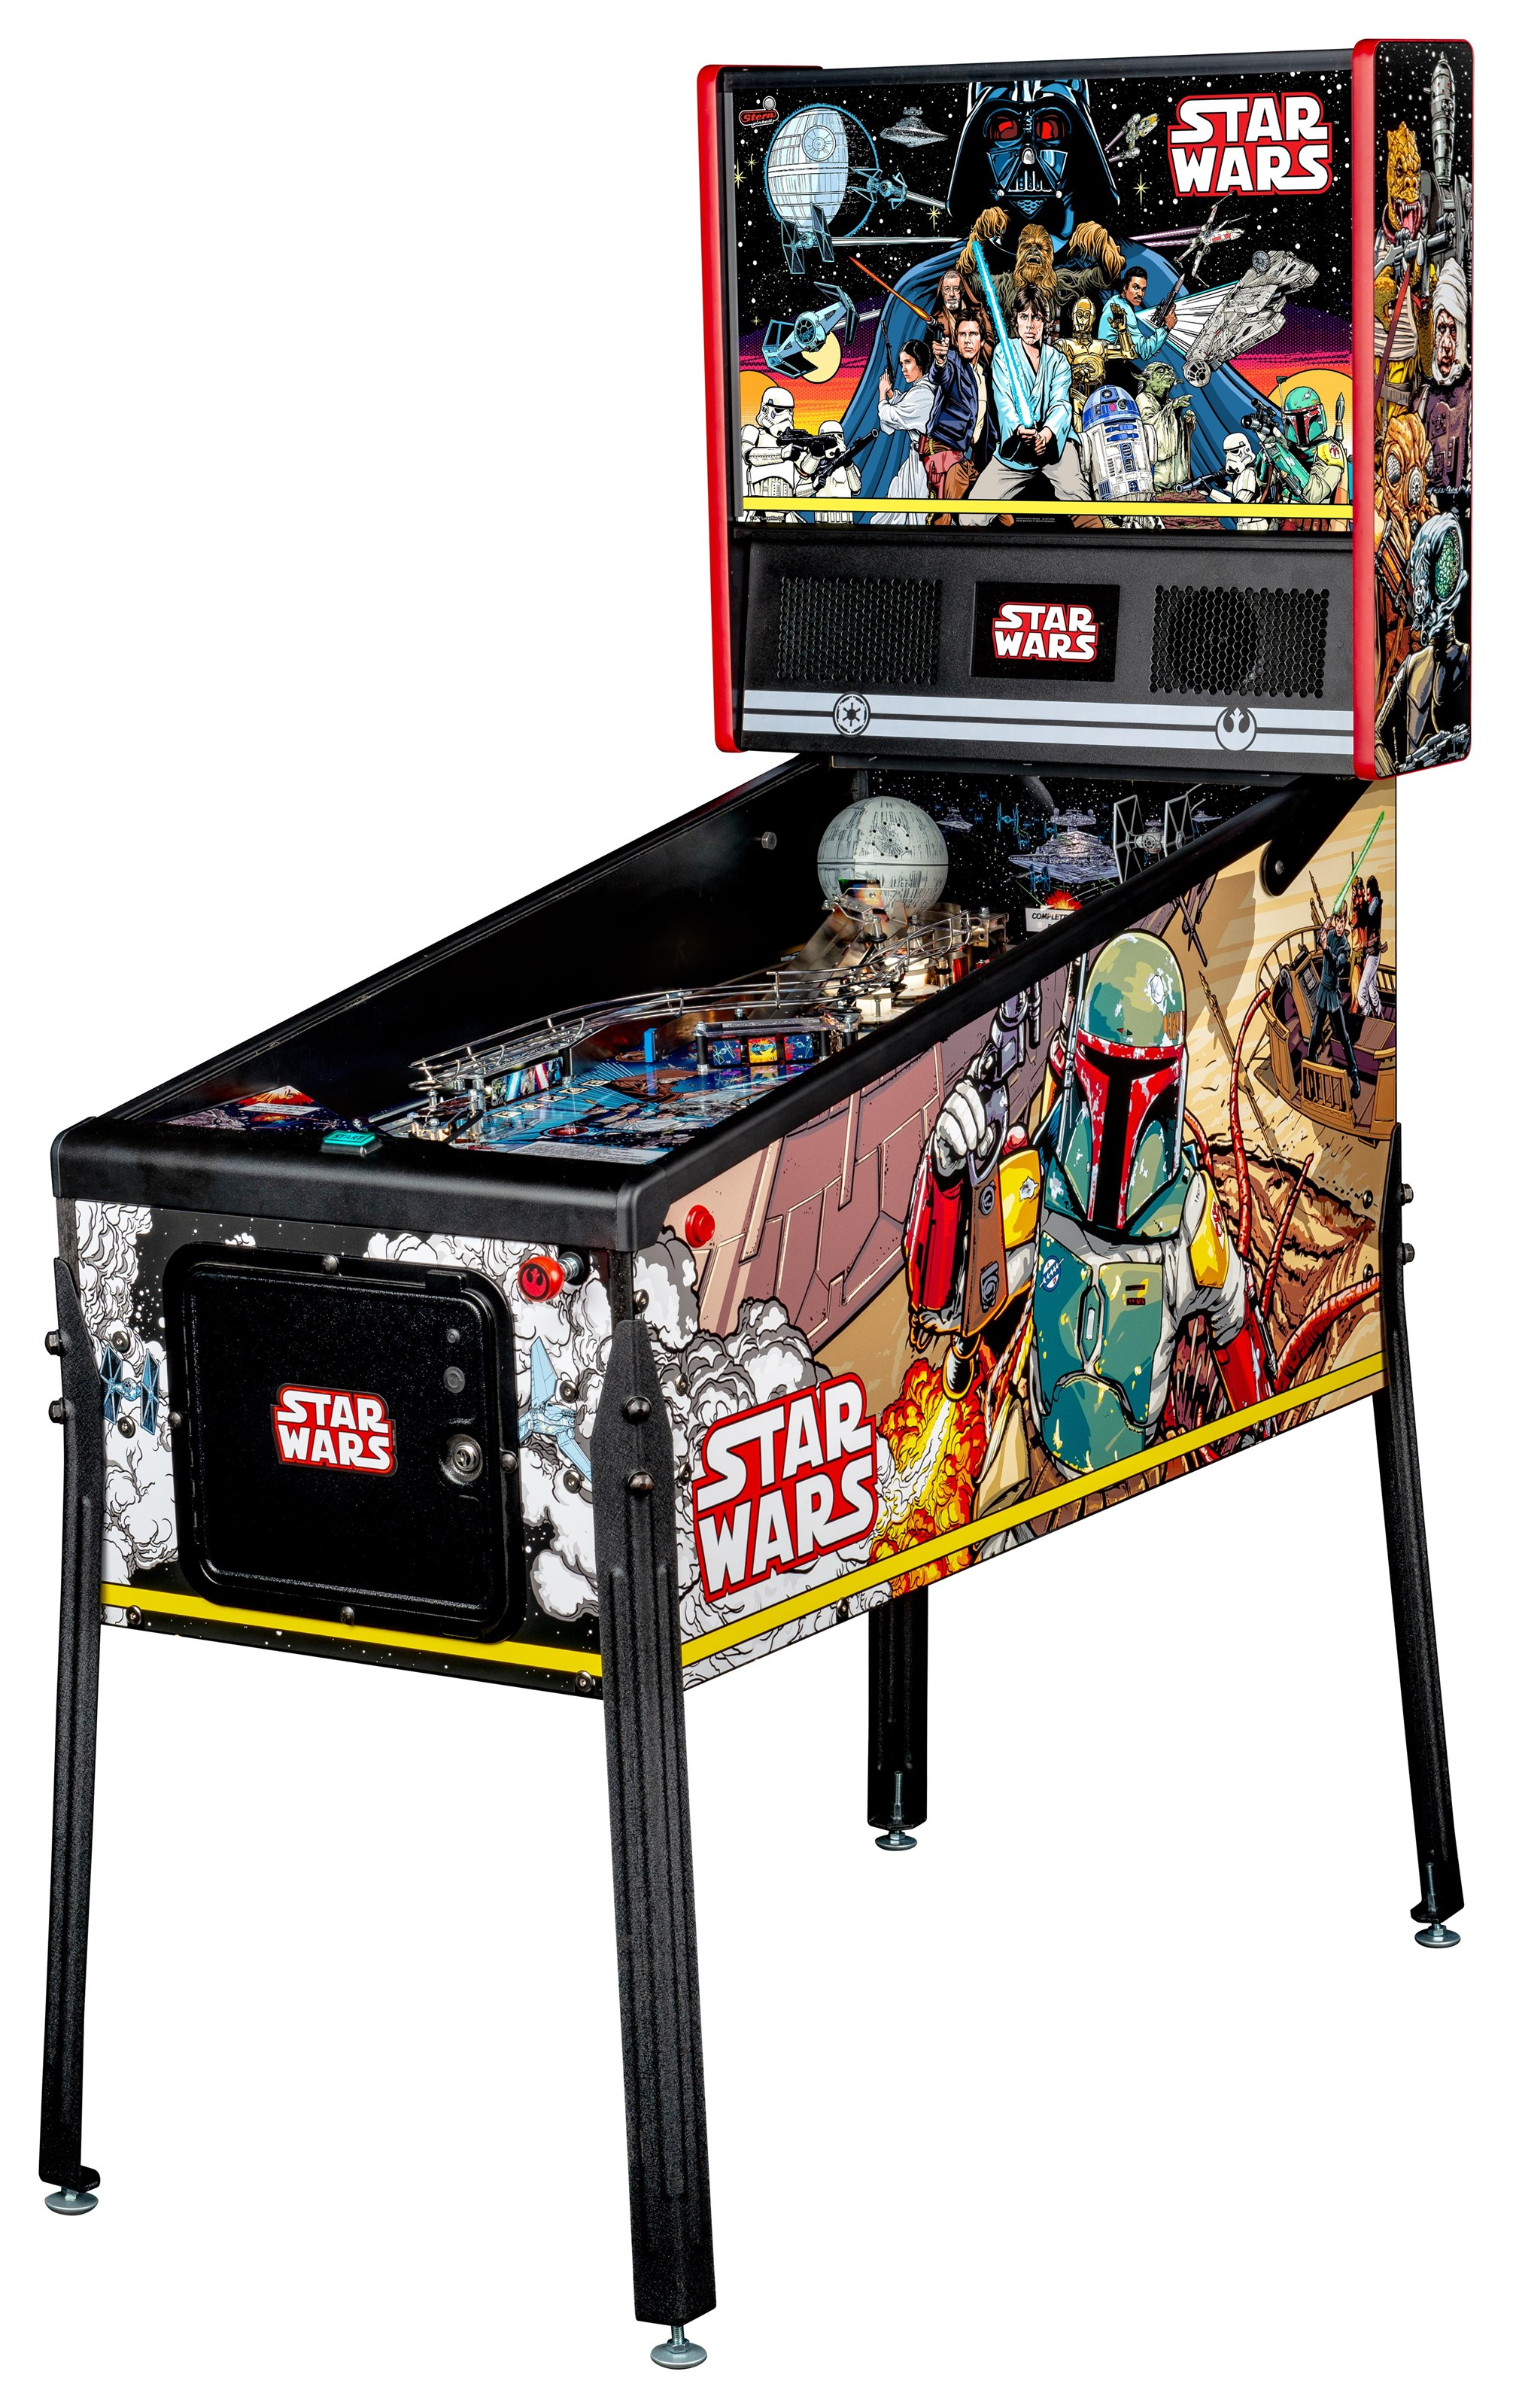 Games Star Wars Comin Pin Pinball Machine by Stern Pinball at Johnny Janosik